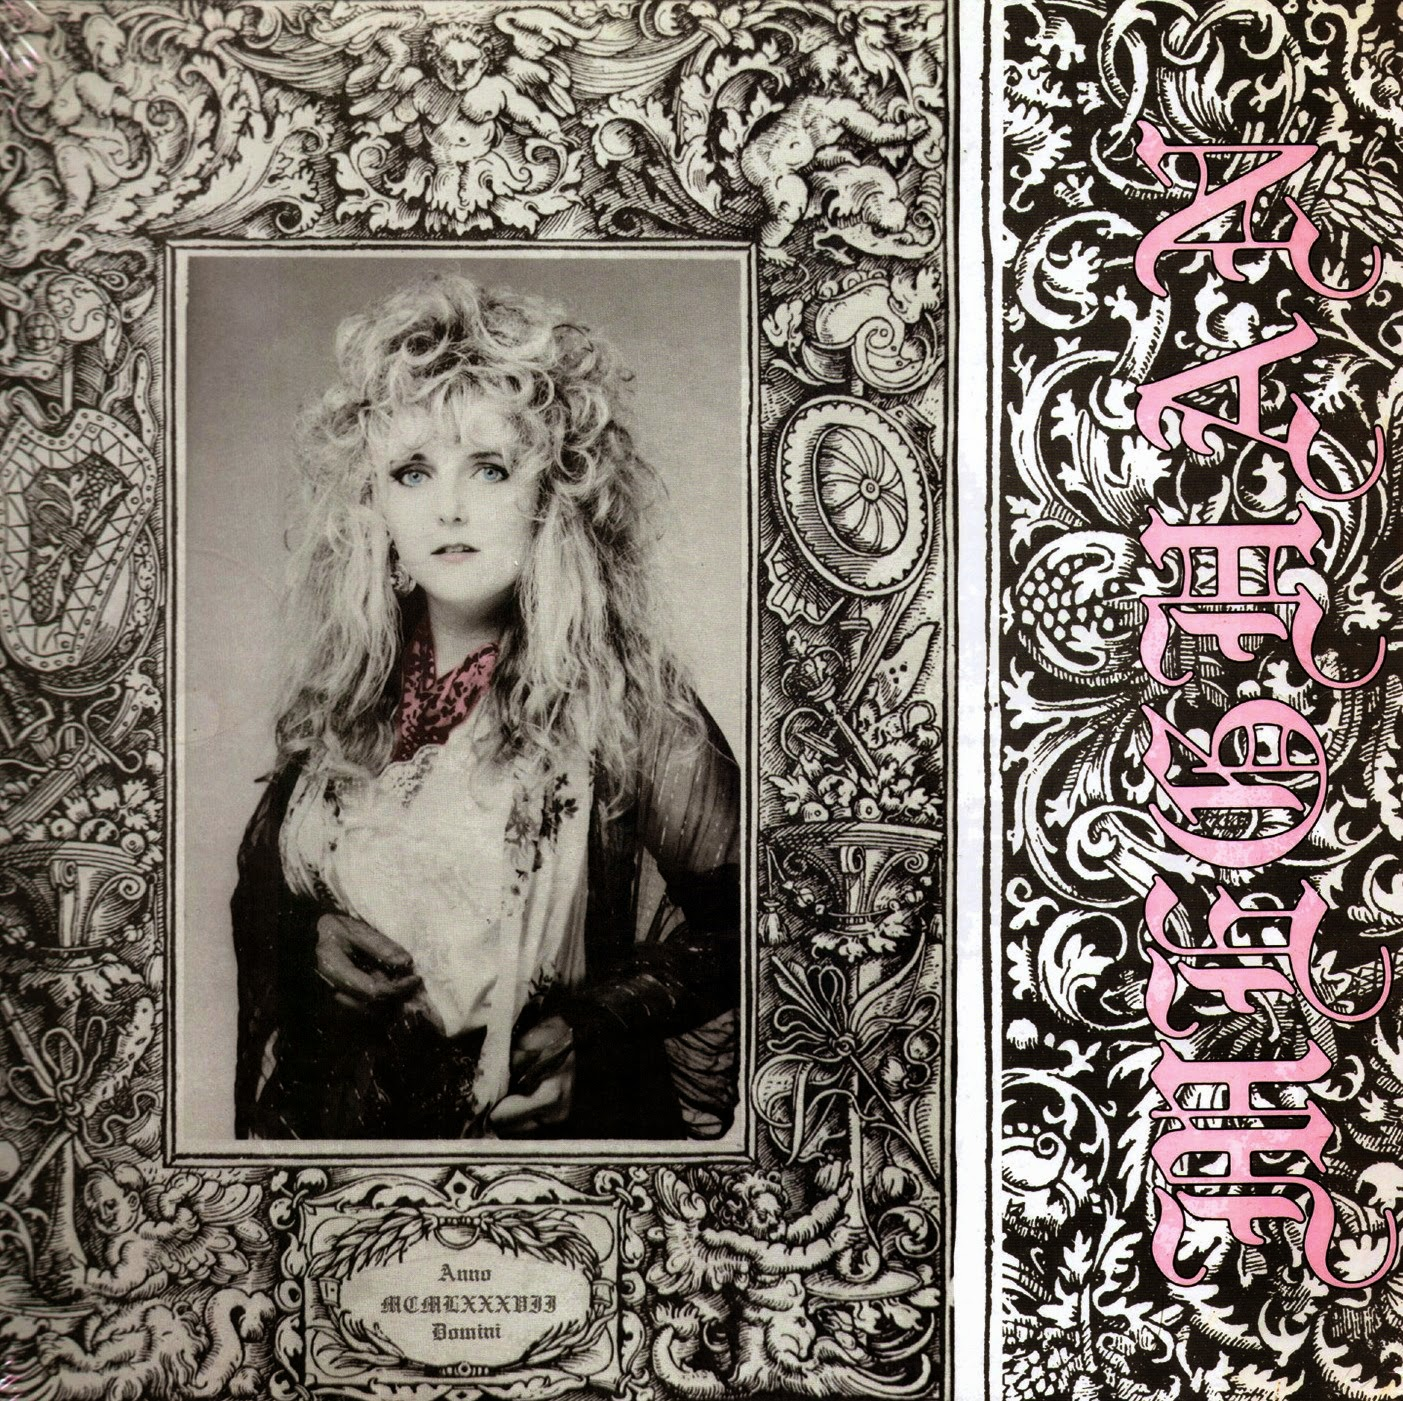 Meghan st 1987 aor melodic rock